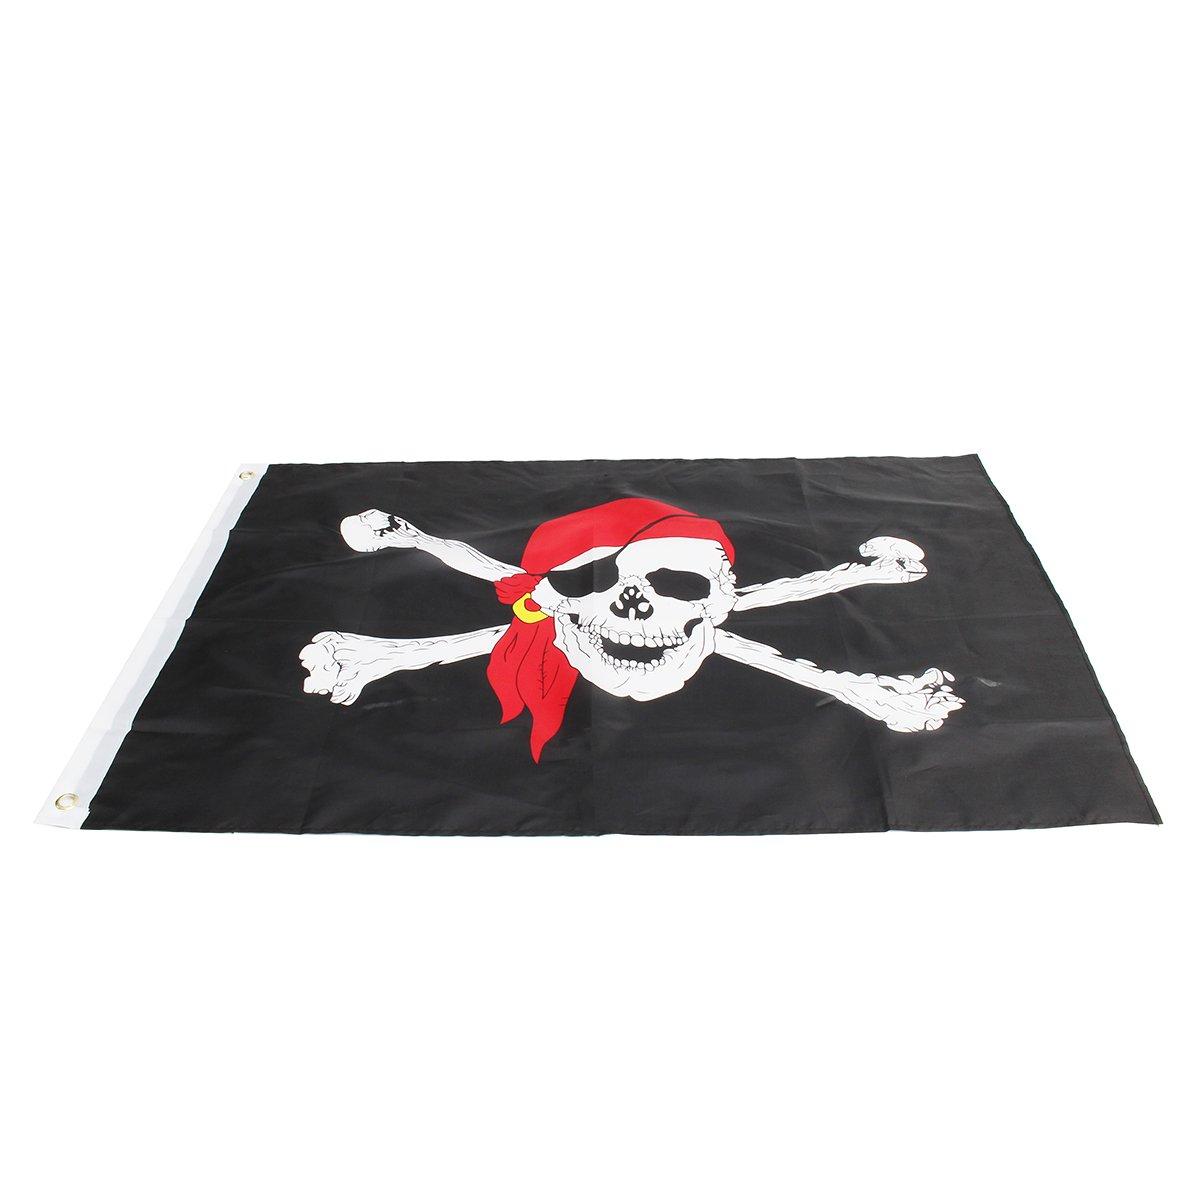 JenNiFer Cr/âne Crossbones Jolly Roger Pirate Drapeau avec Moto Bandana Drapeau Polyester